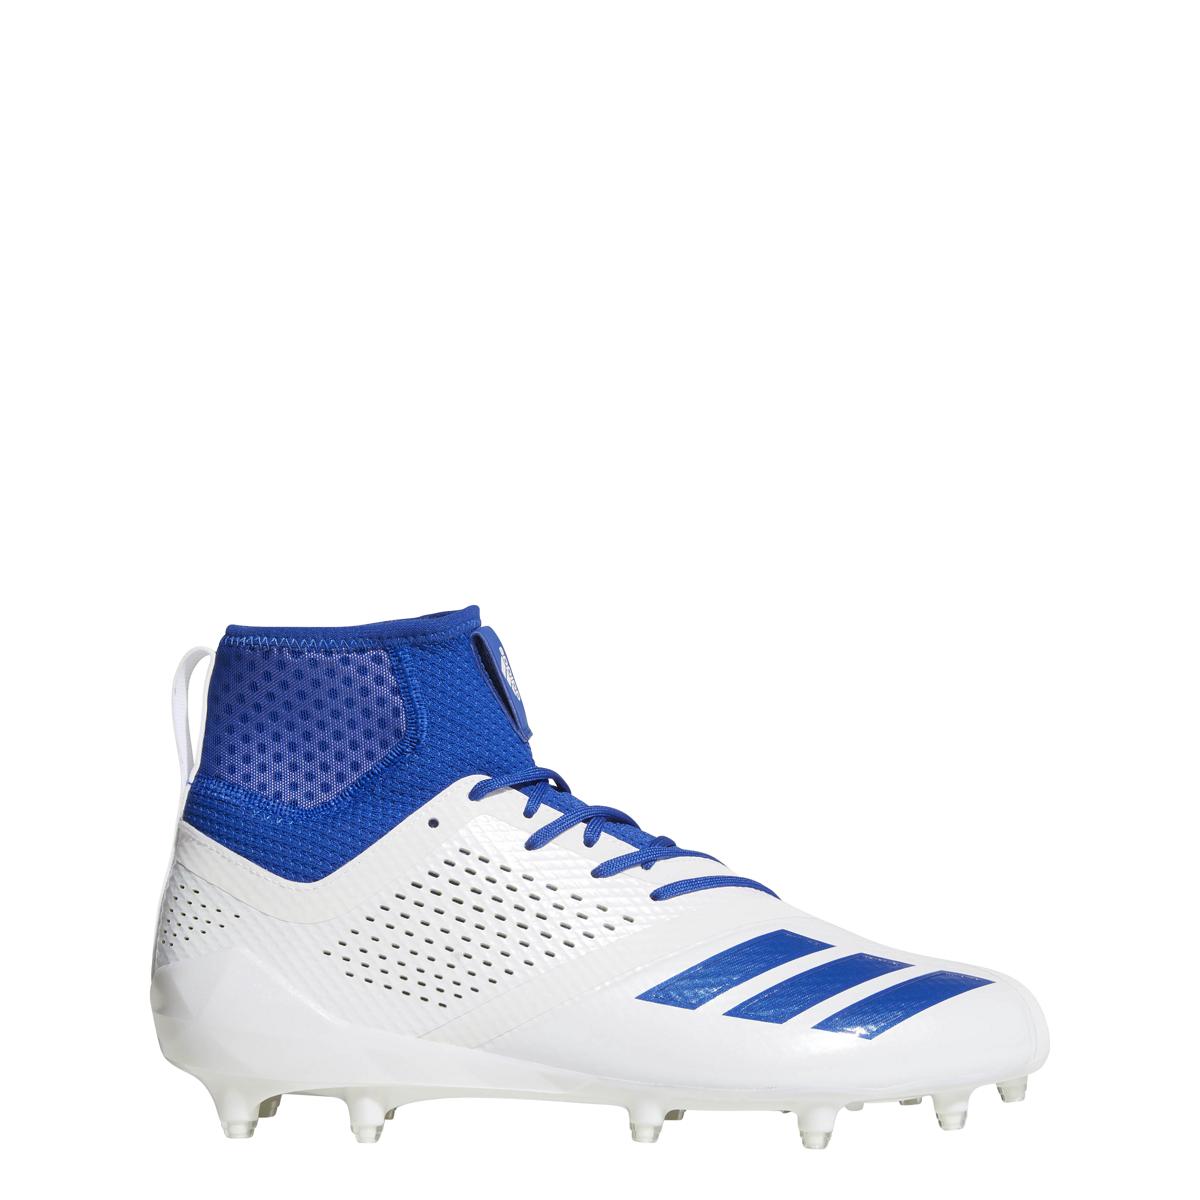 19e20ed0e Details about Men s Adidas Adizero 5 Star 7.0 SK Football Cleat  White Collegiate Royal